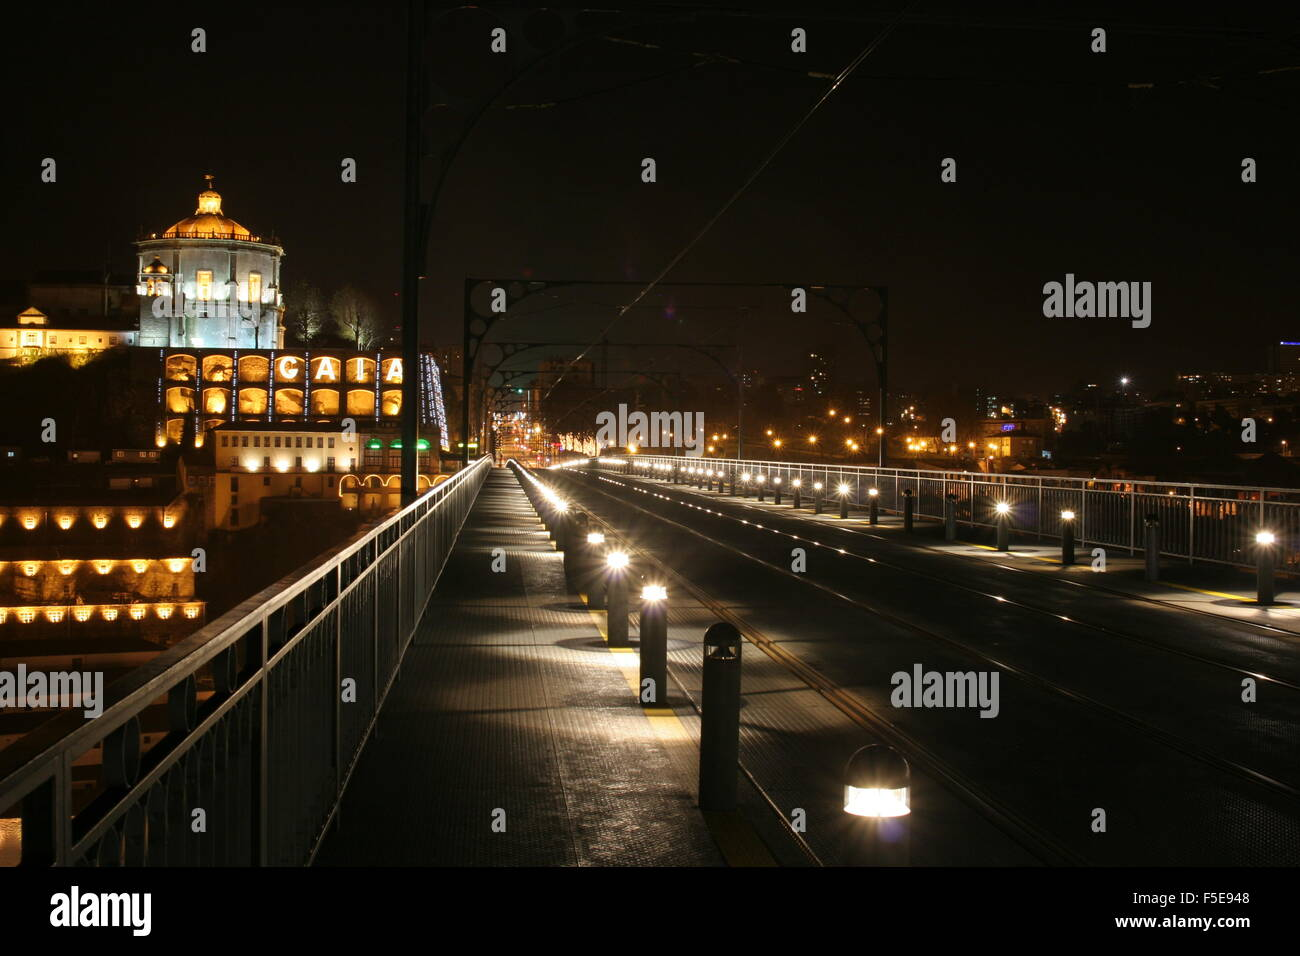 Luis I bridge at night, Porto, Portugal - Stock Image